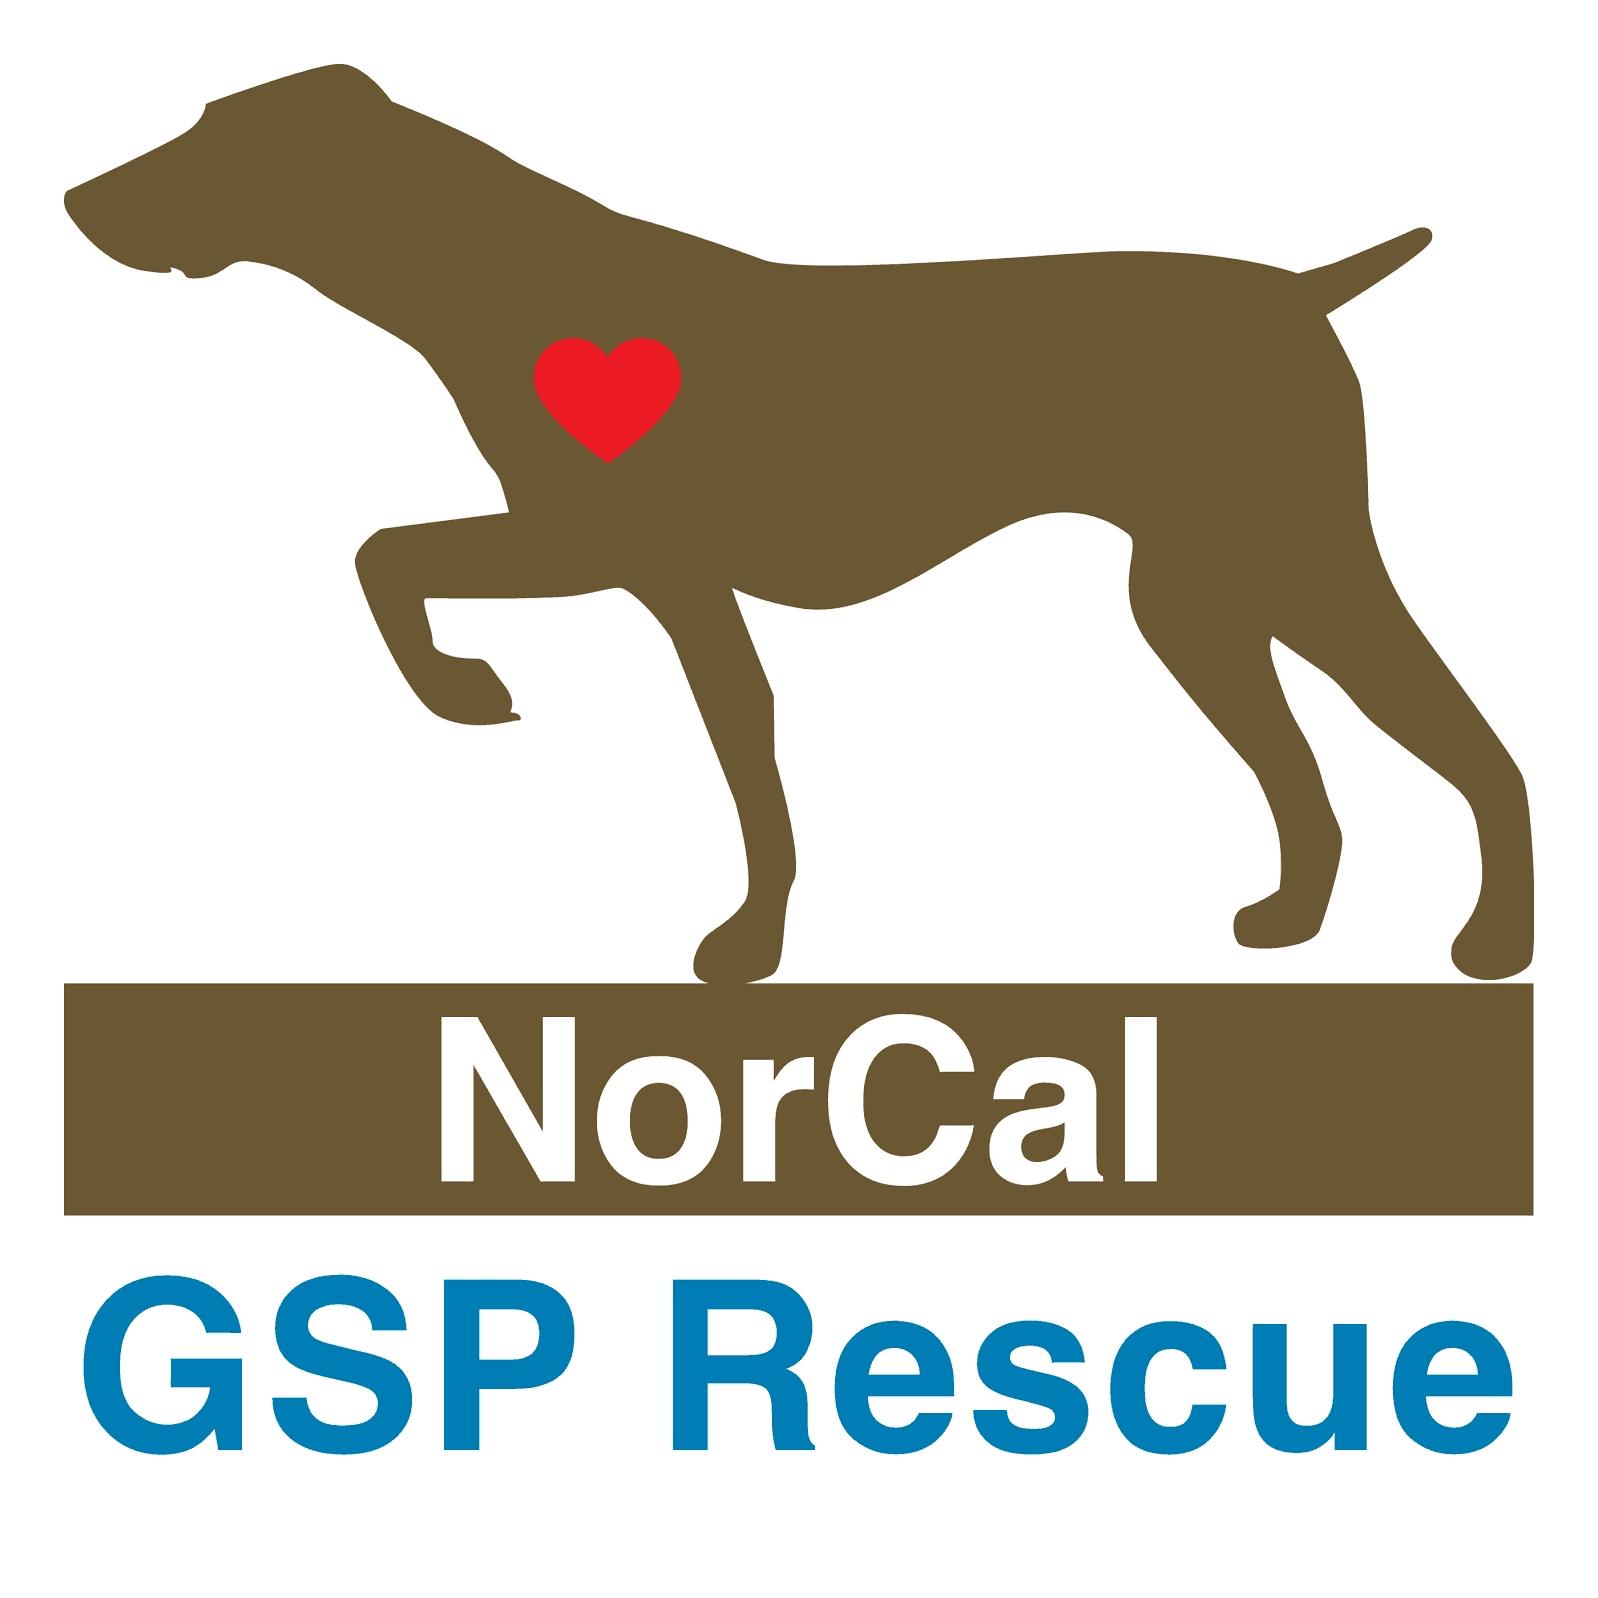 Norcalgsprescue logo